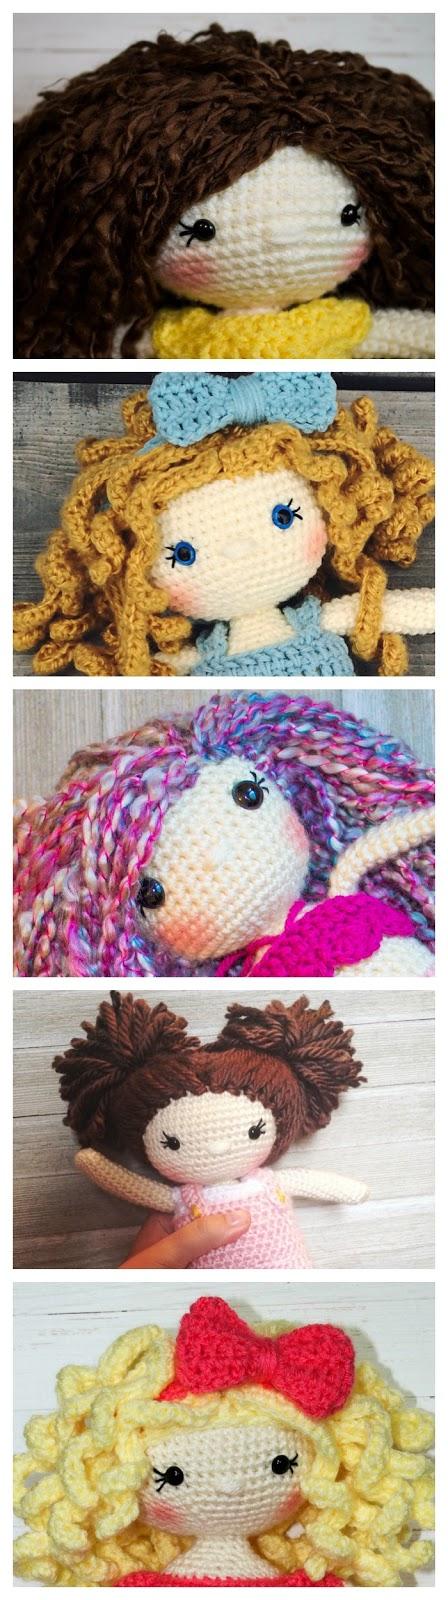 How To Attach Hair To A Crochet Doll Thefriendlyredfox Com